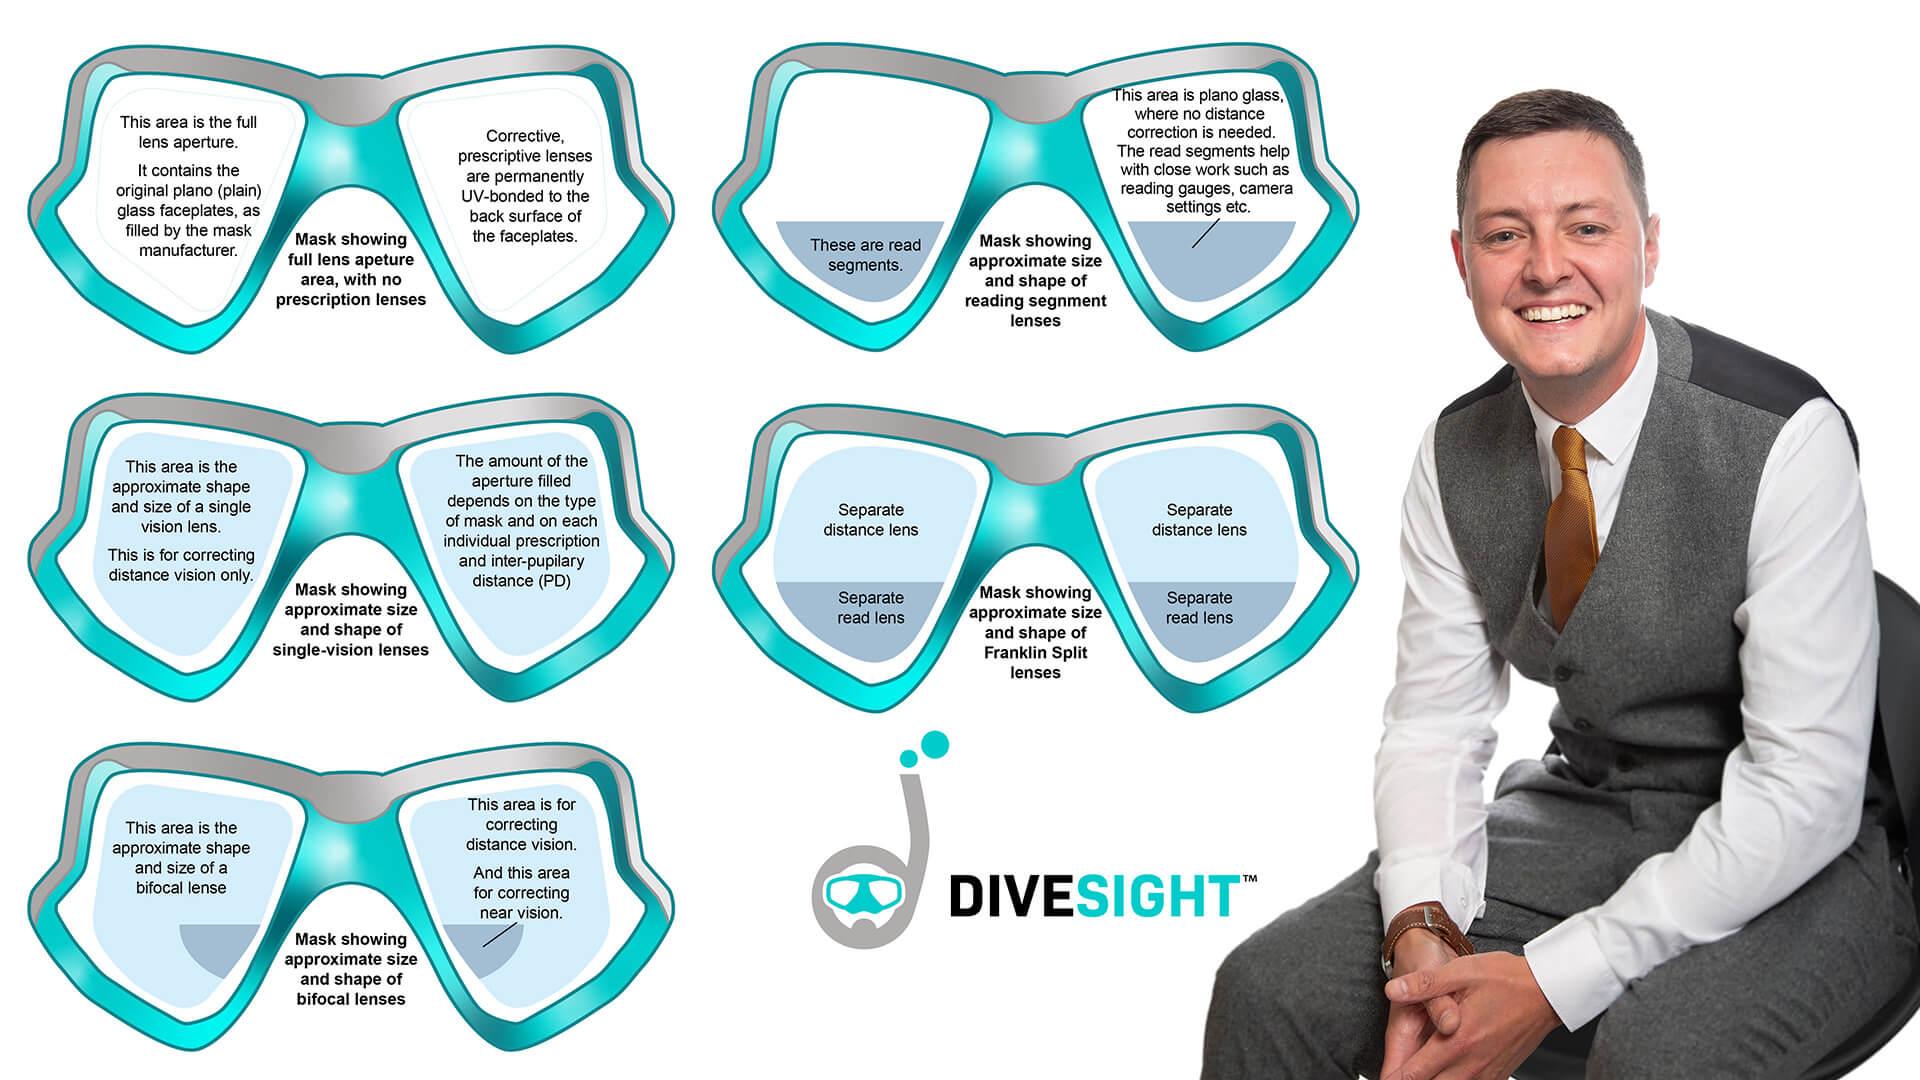 divesight 6